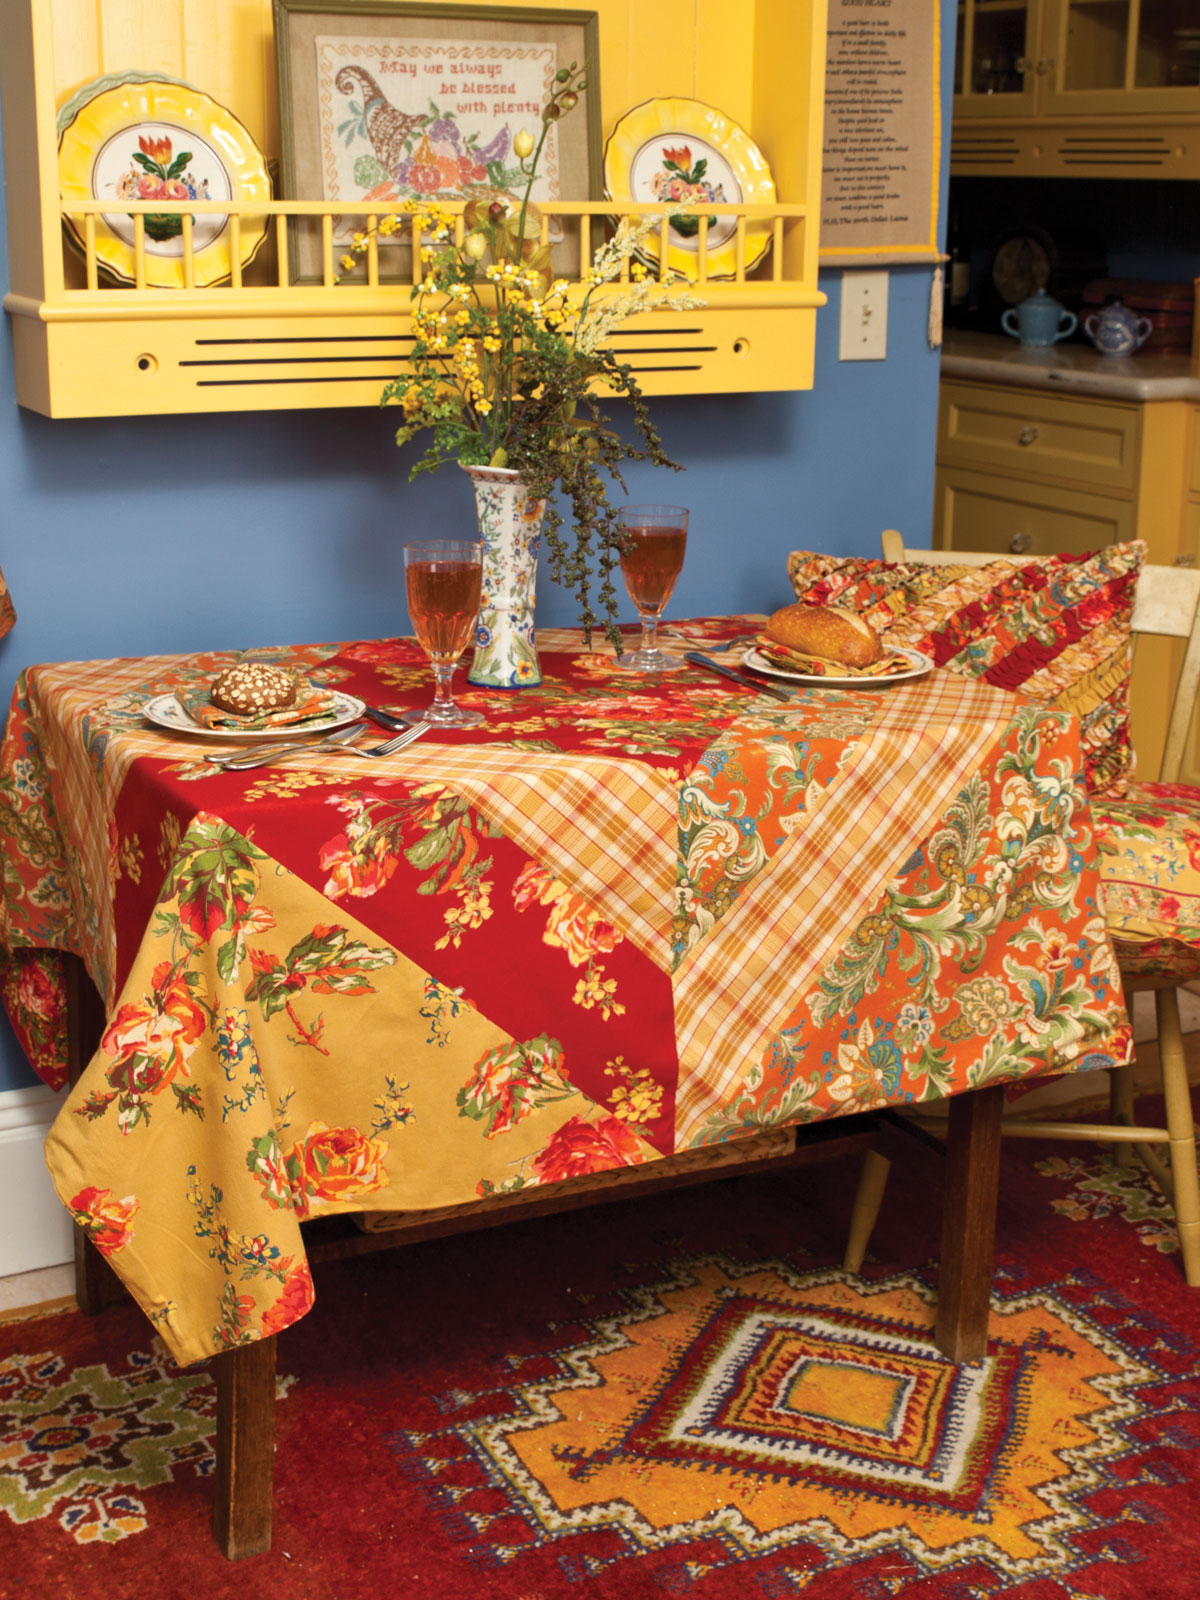 Alternate3. Alternate2. Indian Summer Patchwork Tablecloth